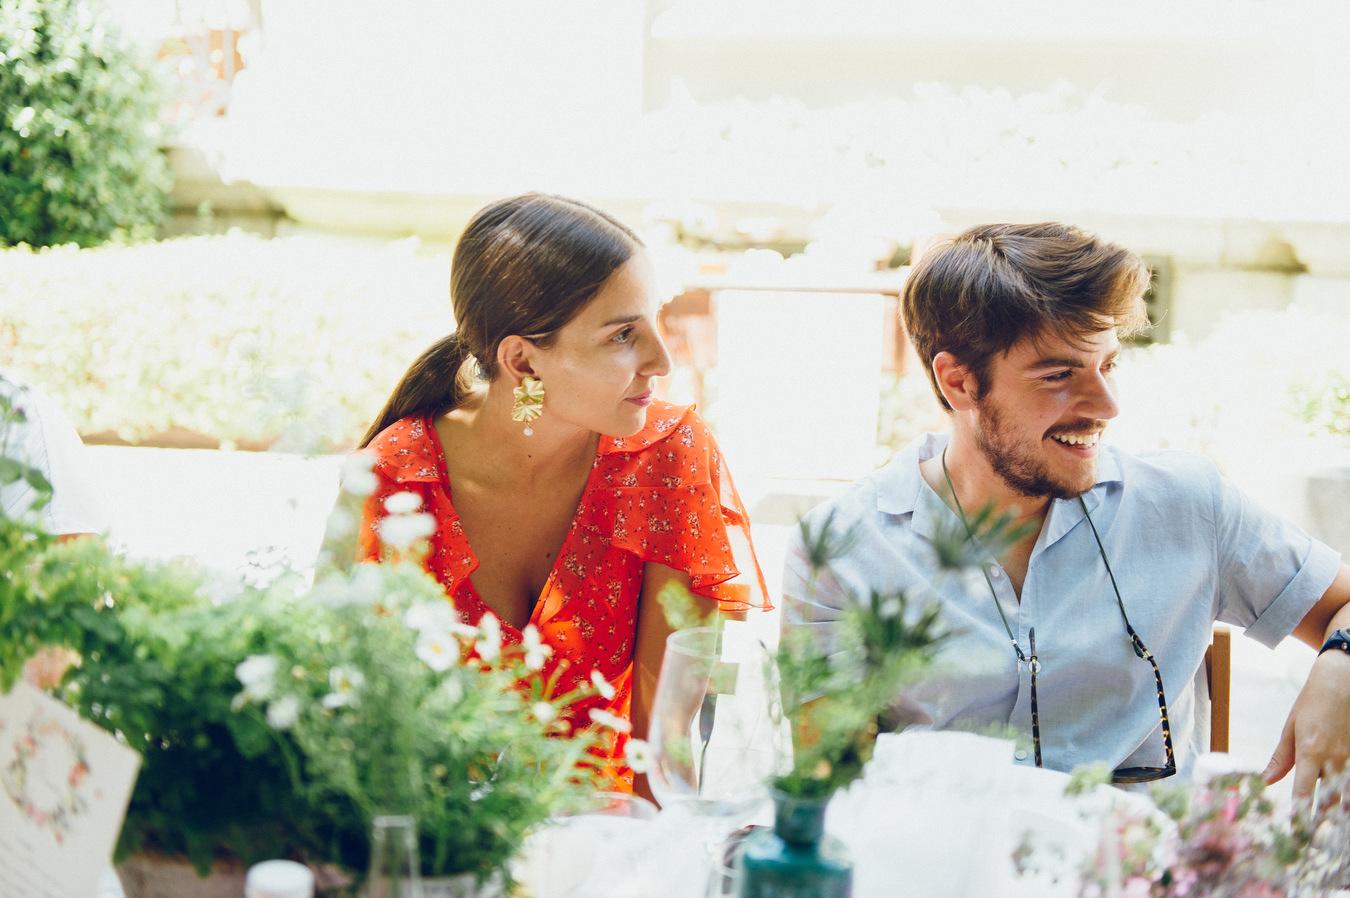 calista-one-lista-de-bodas-online-blog-de-bodas-calista-one-summer-party-2016-invitados-6